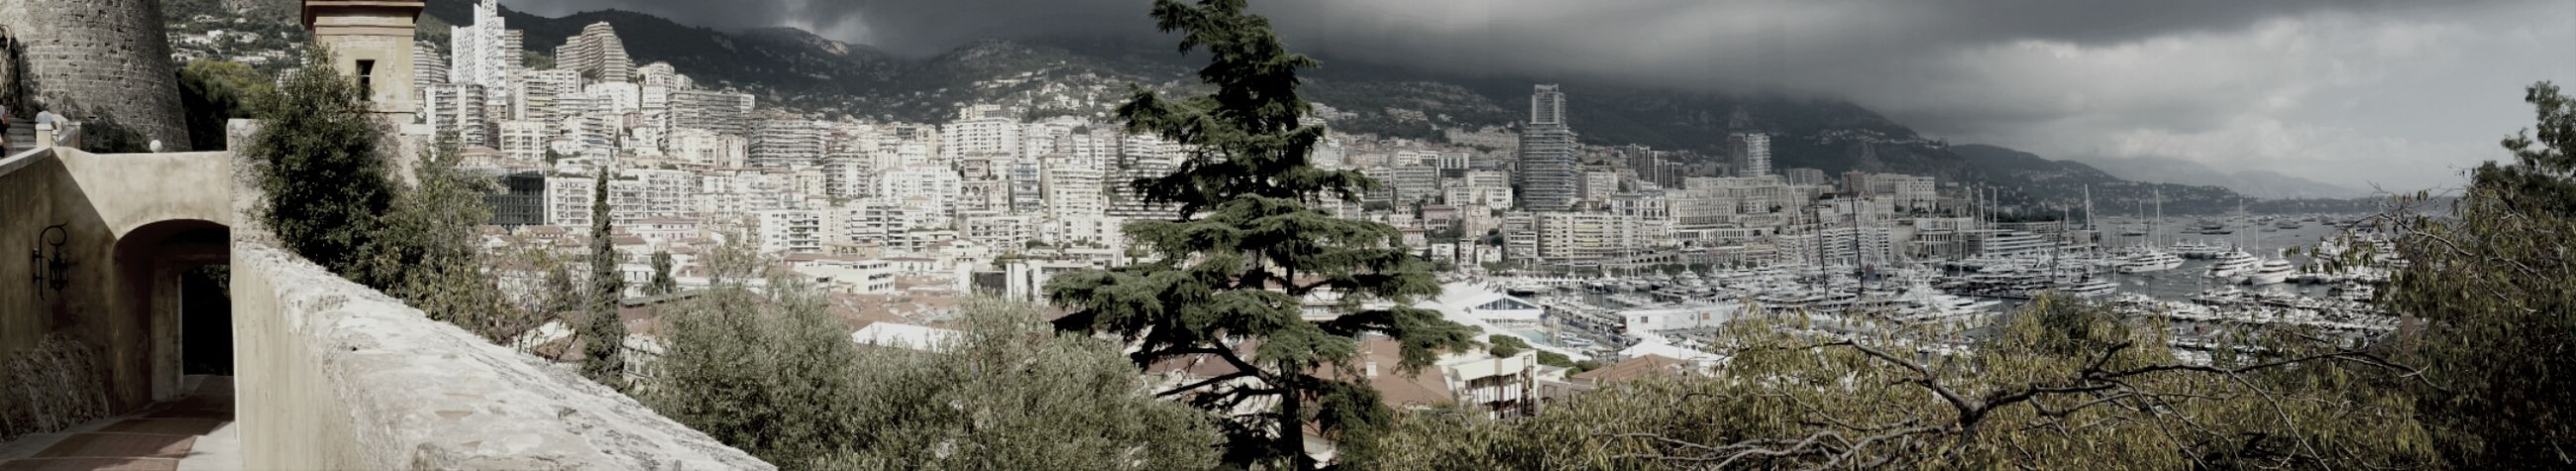 Monaco Weather WearherPro : The Perfect Weather Shot Studienfahrt